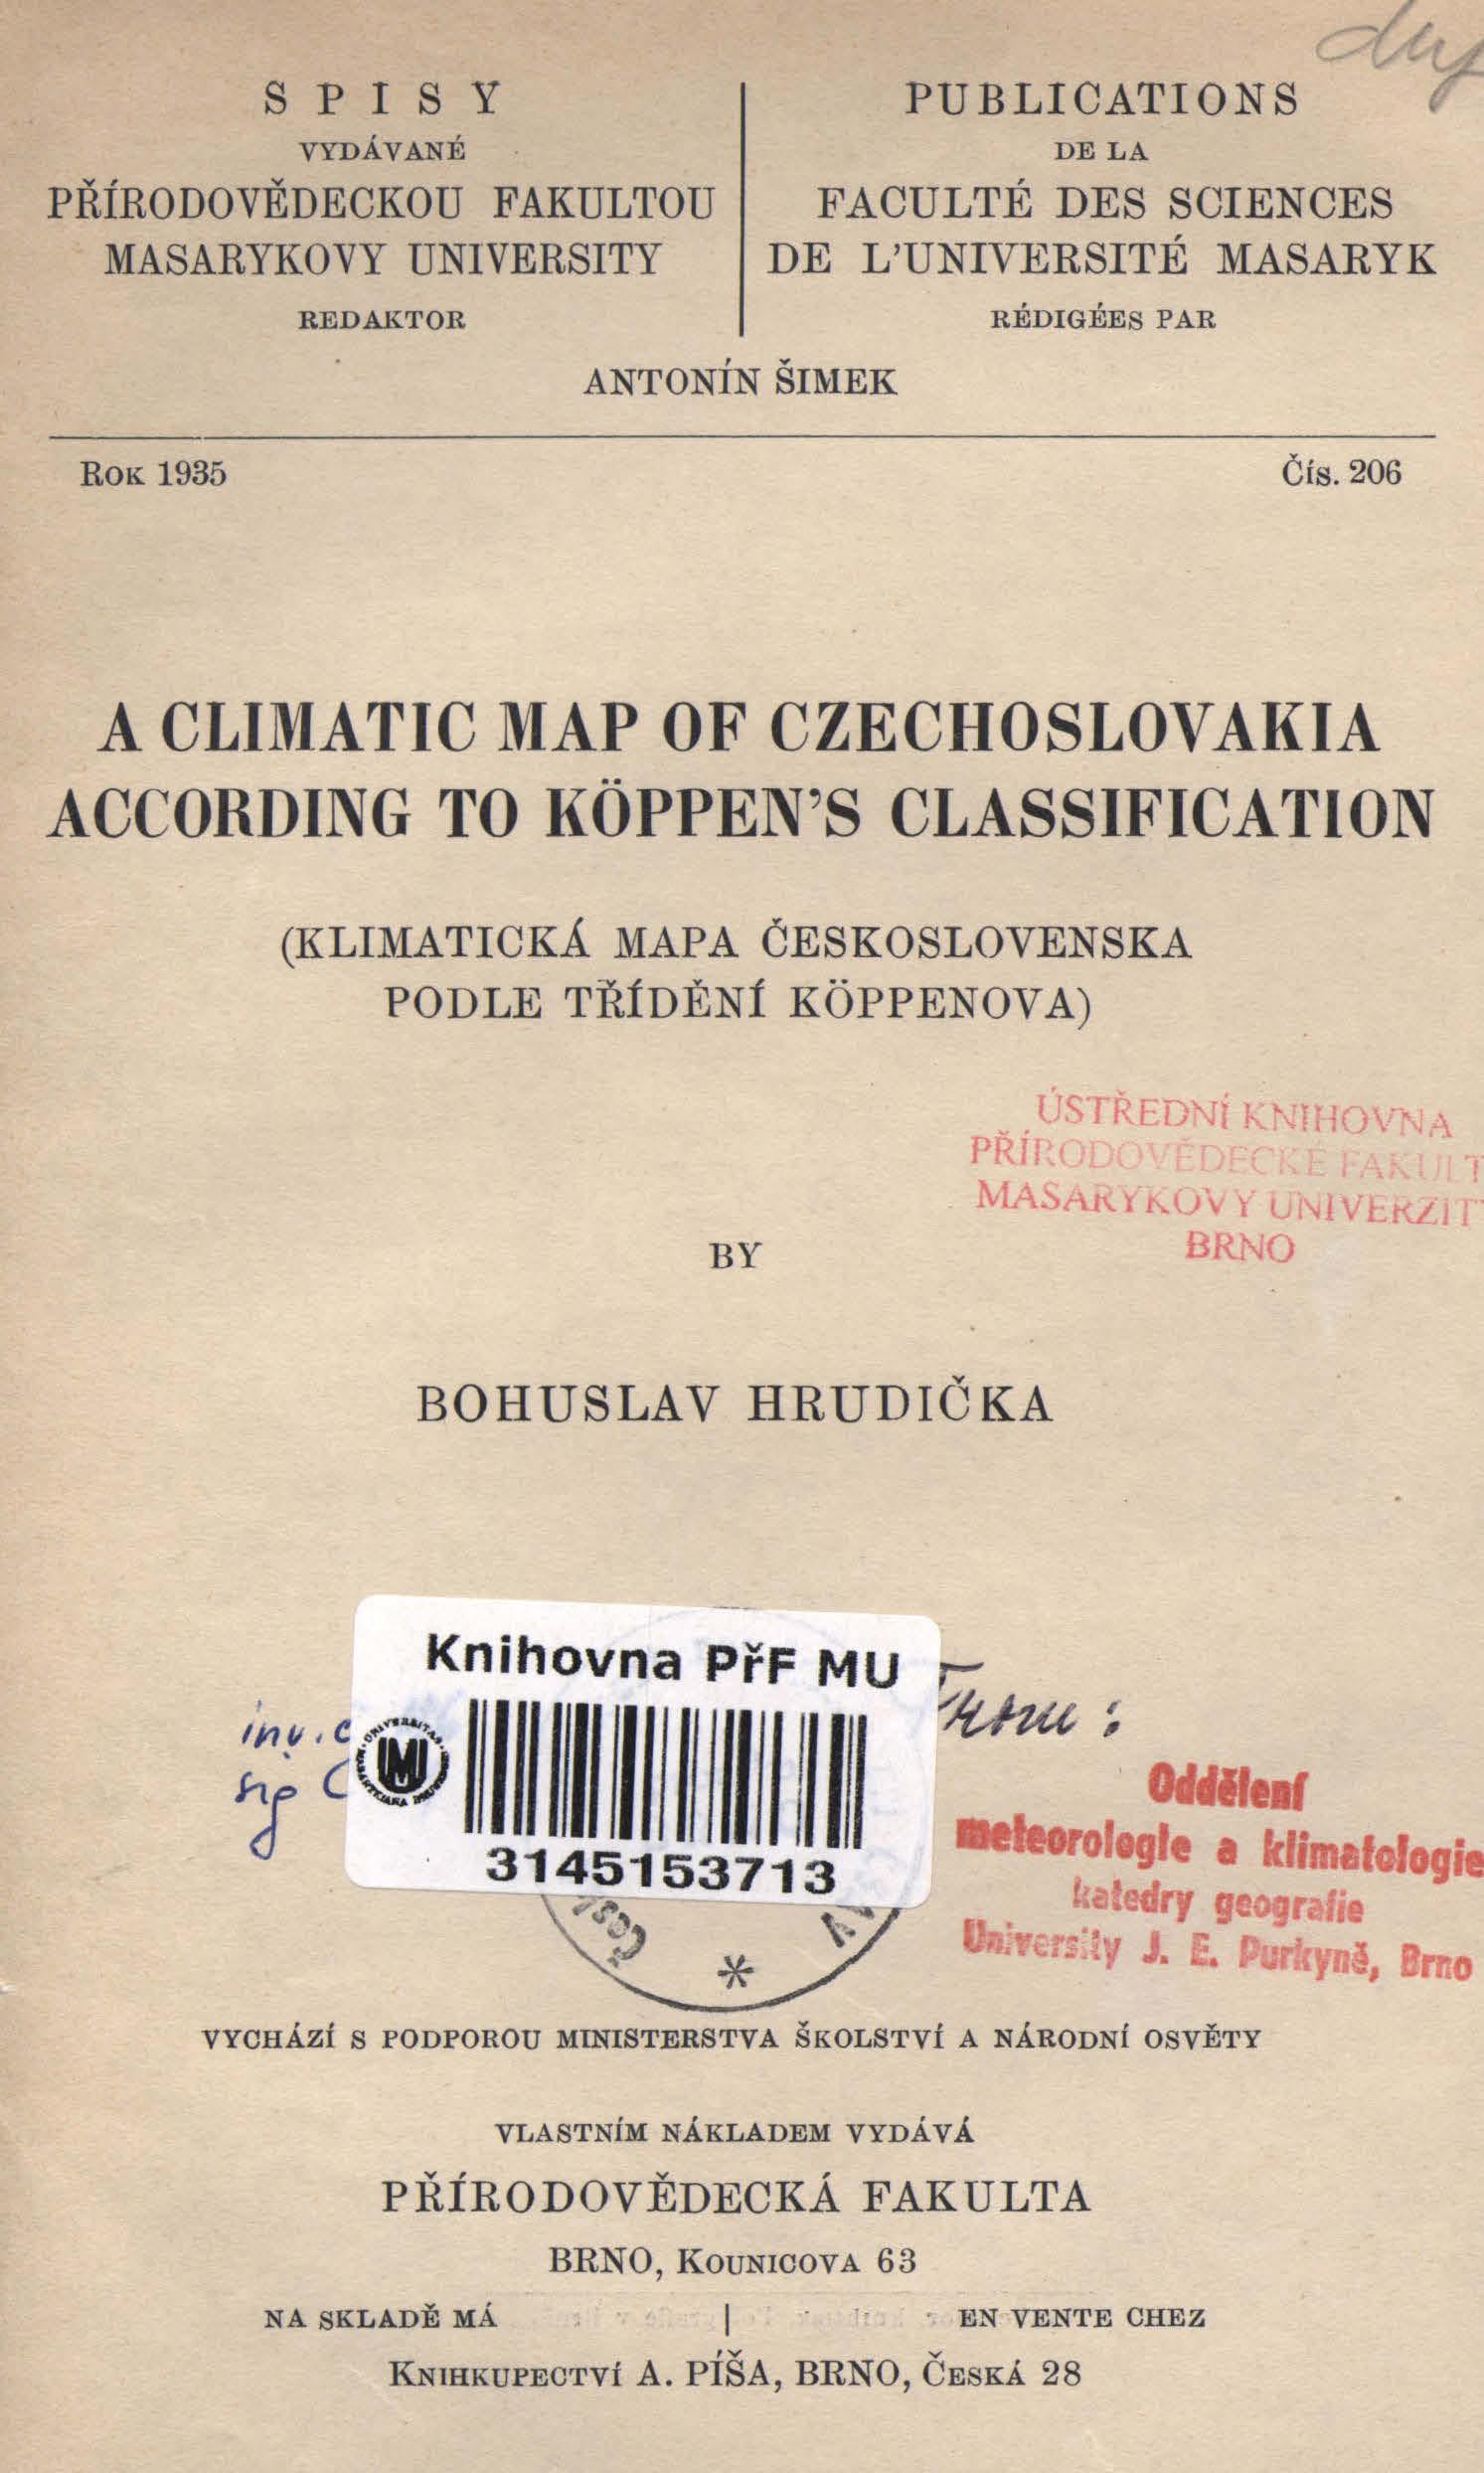 Obálka pro A climatic map of Czechoslovakie according to Köppen's classification